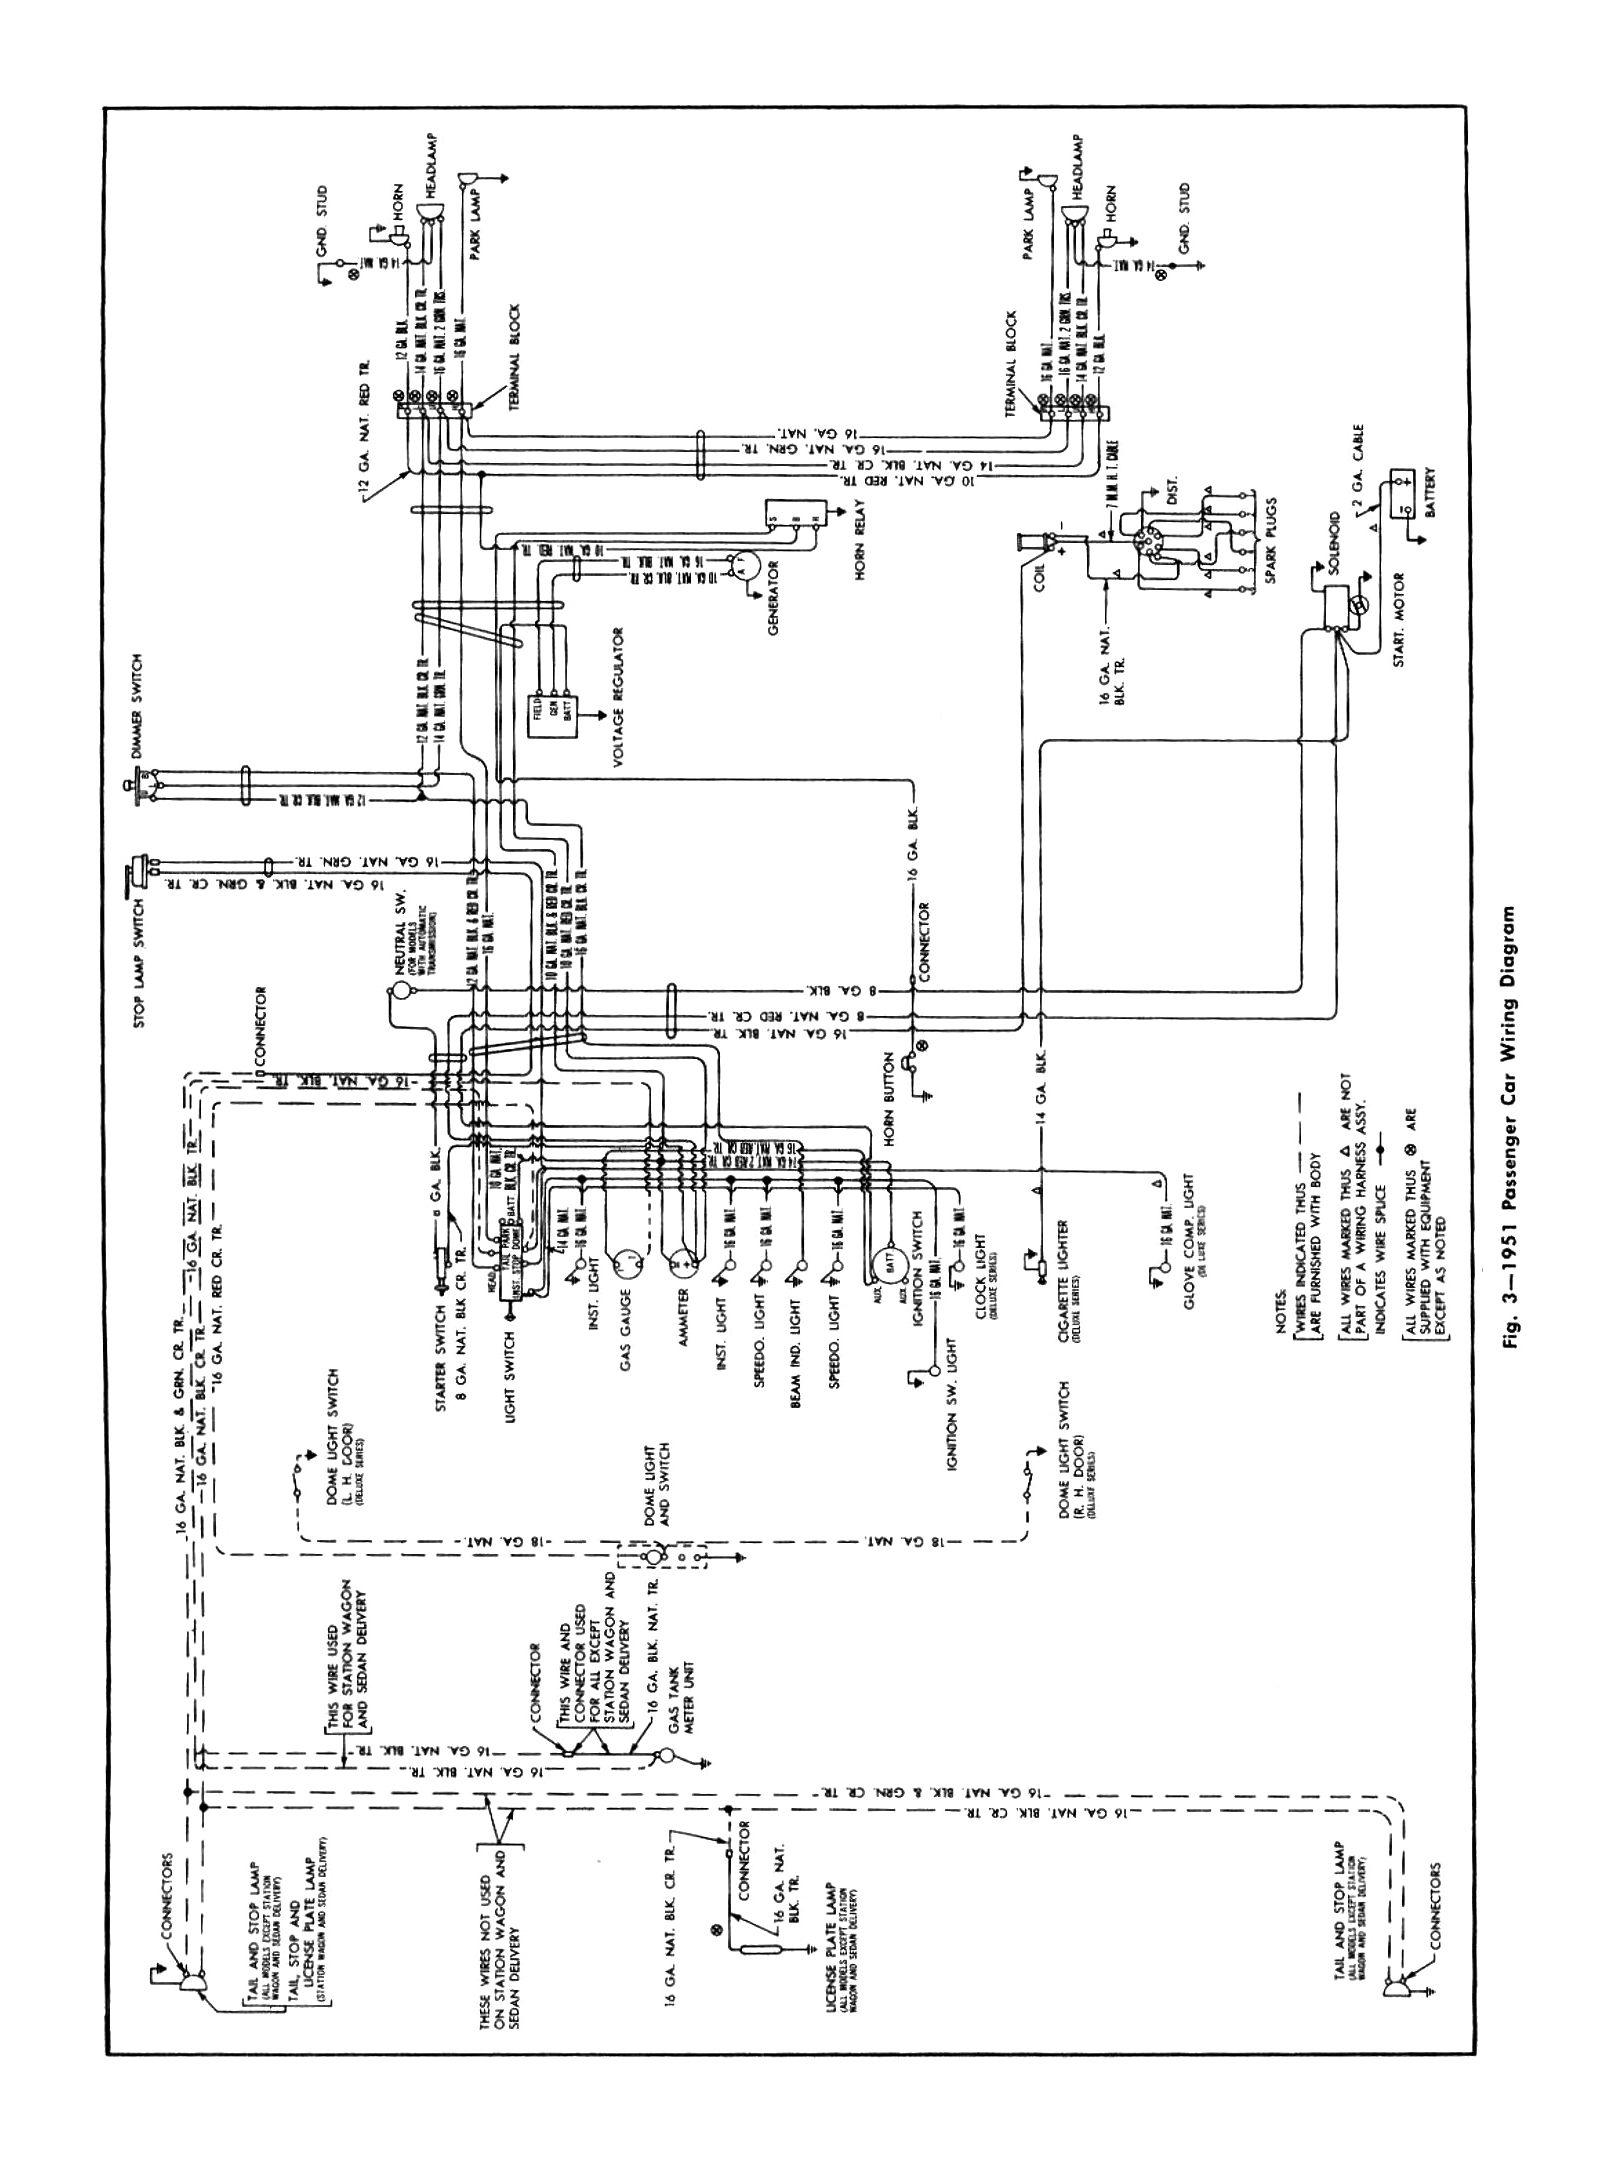 2008 ez go 36 volt wiring diagram